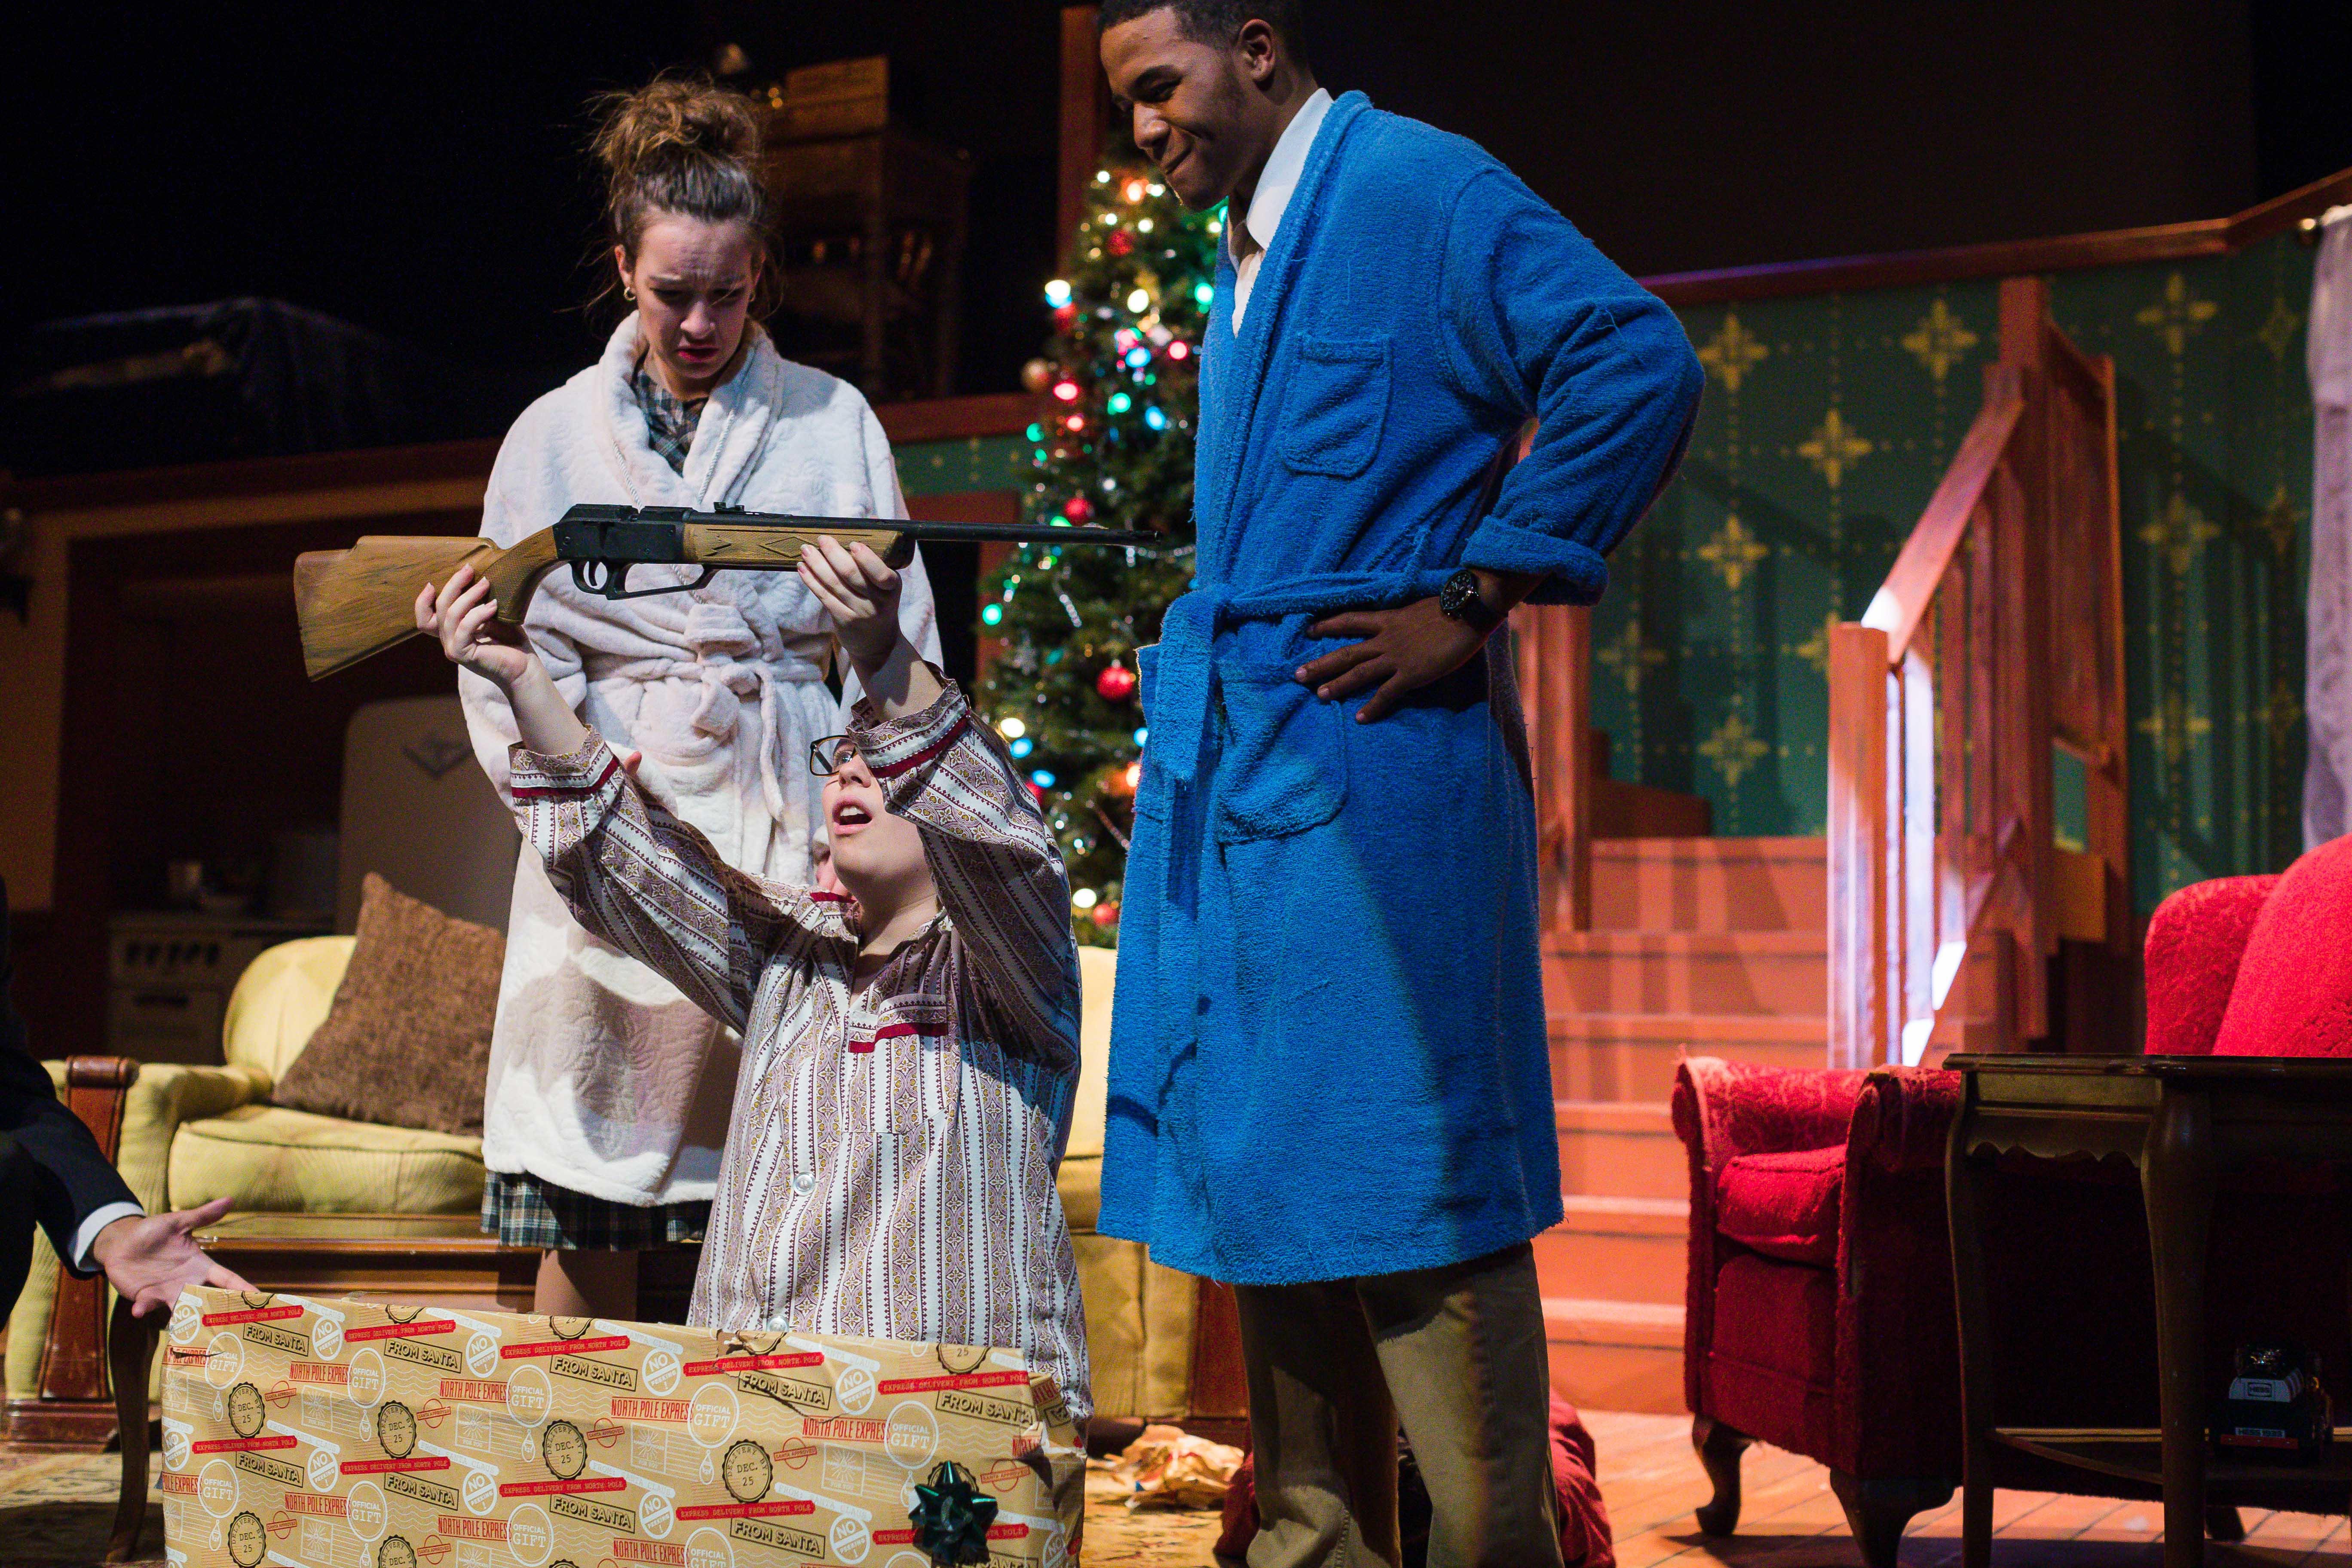 Weaver_Christmasshoot-_MG_1554